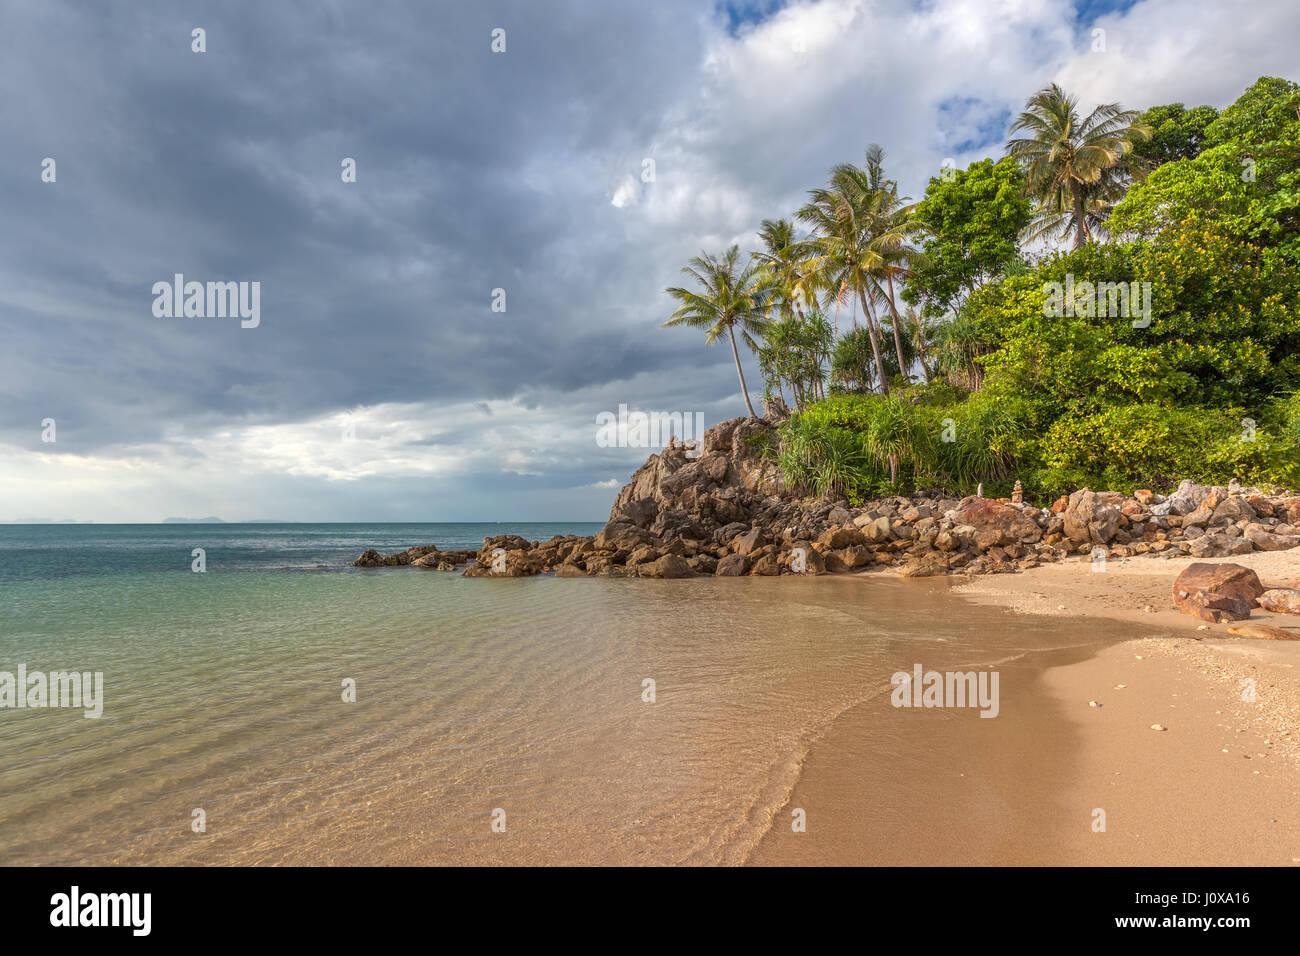 Long Beach in Koh Lanta Yai, Krabi Province, Thailand, Southeast Asia - Stock Image